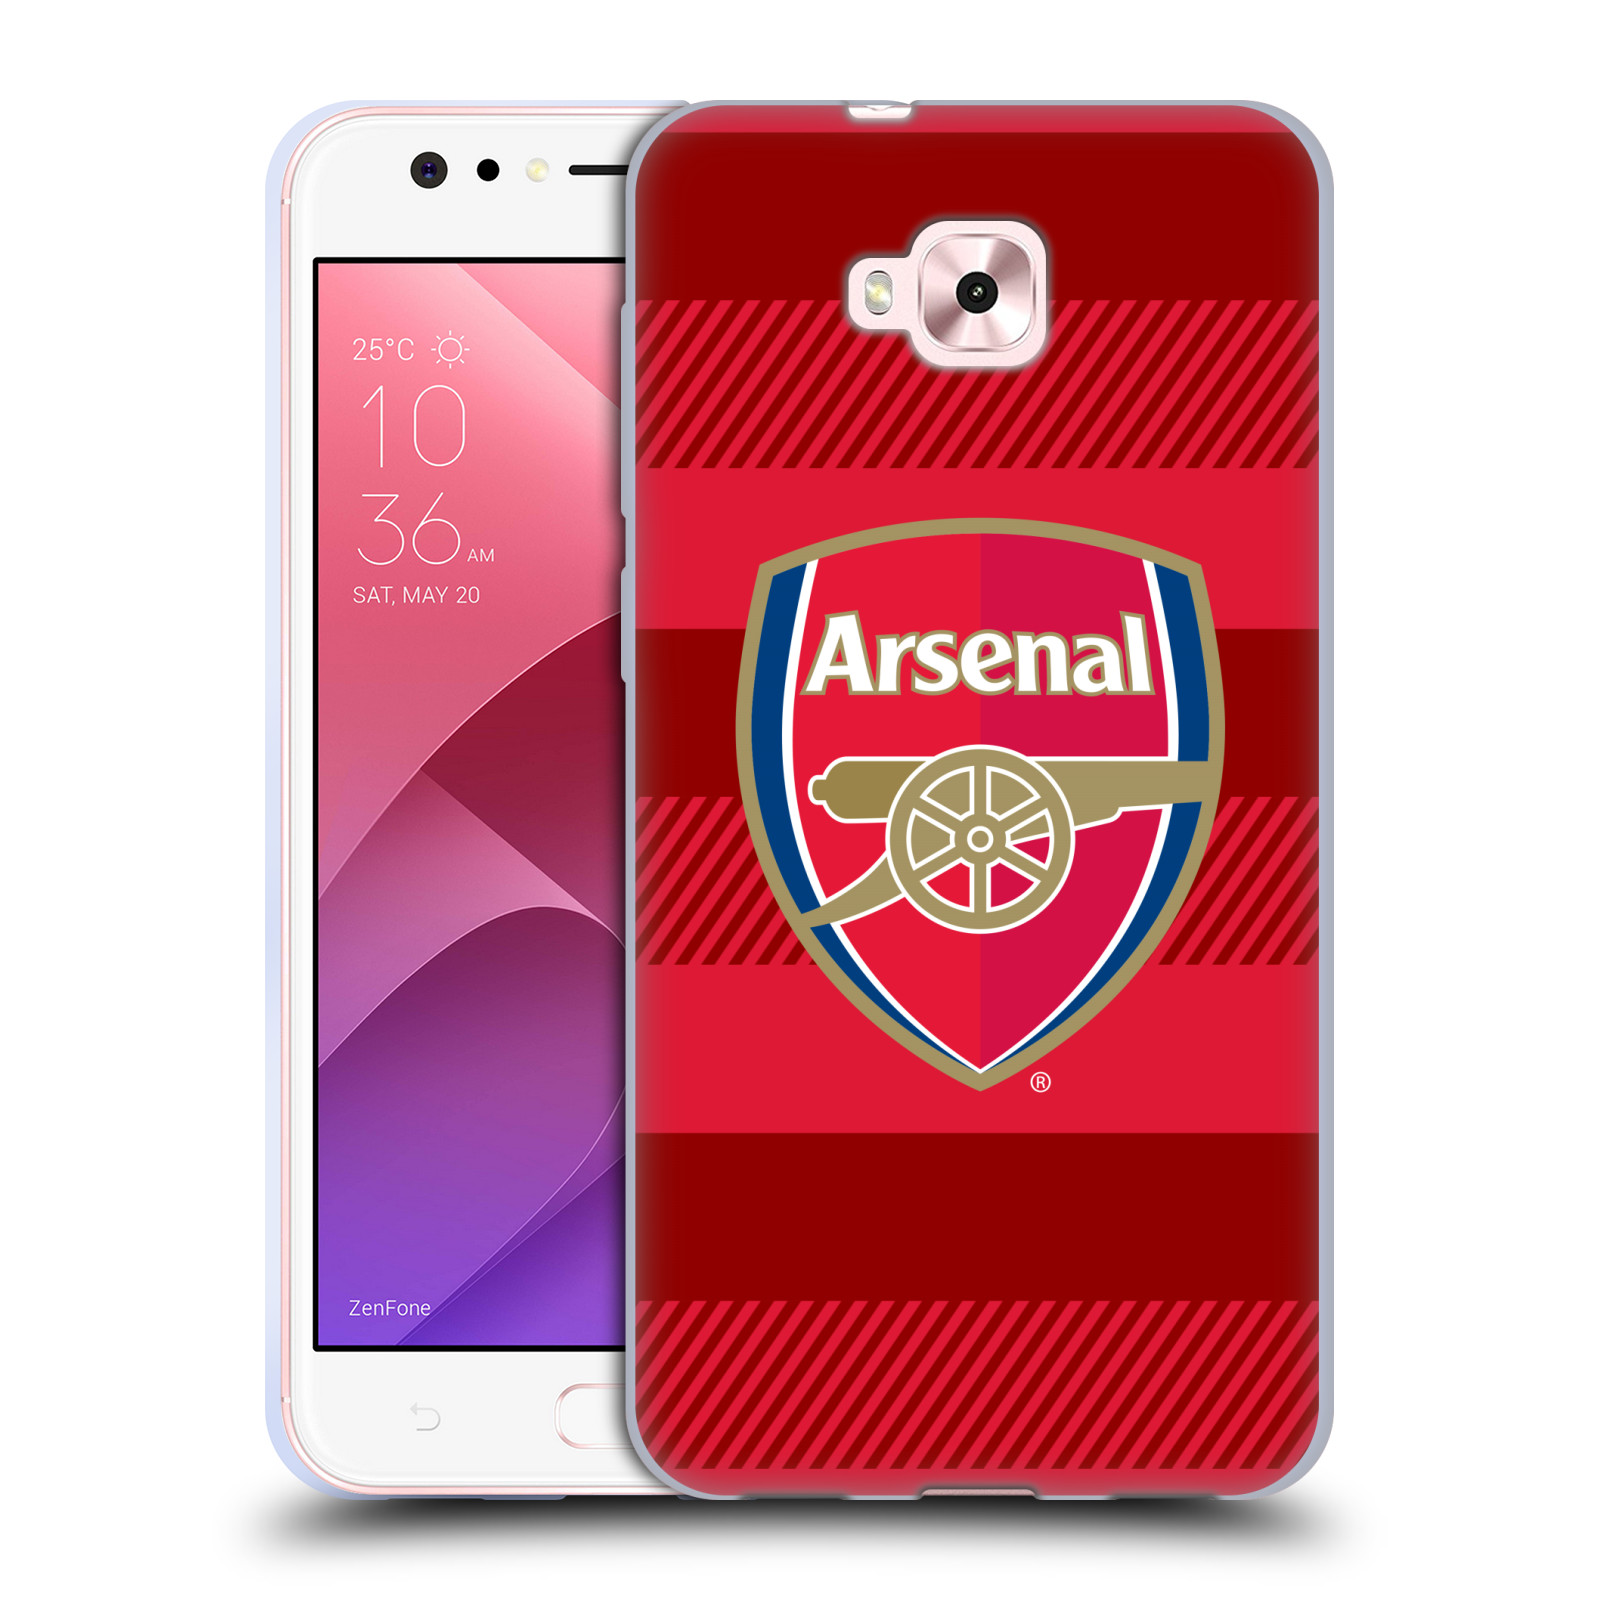 Silikonové pouzdro na mobil Asus Zenfone 4 Selfie ZD553KL - Head Case - Arsenal FC - Logo s pruhy